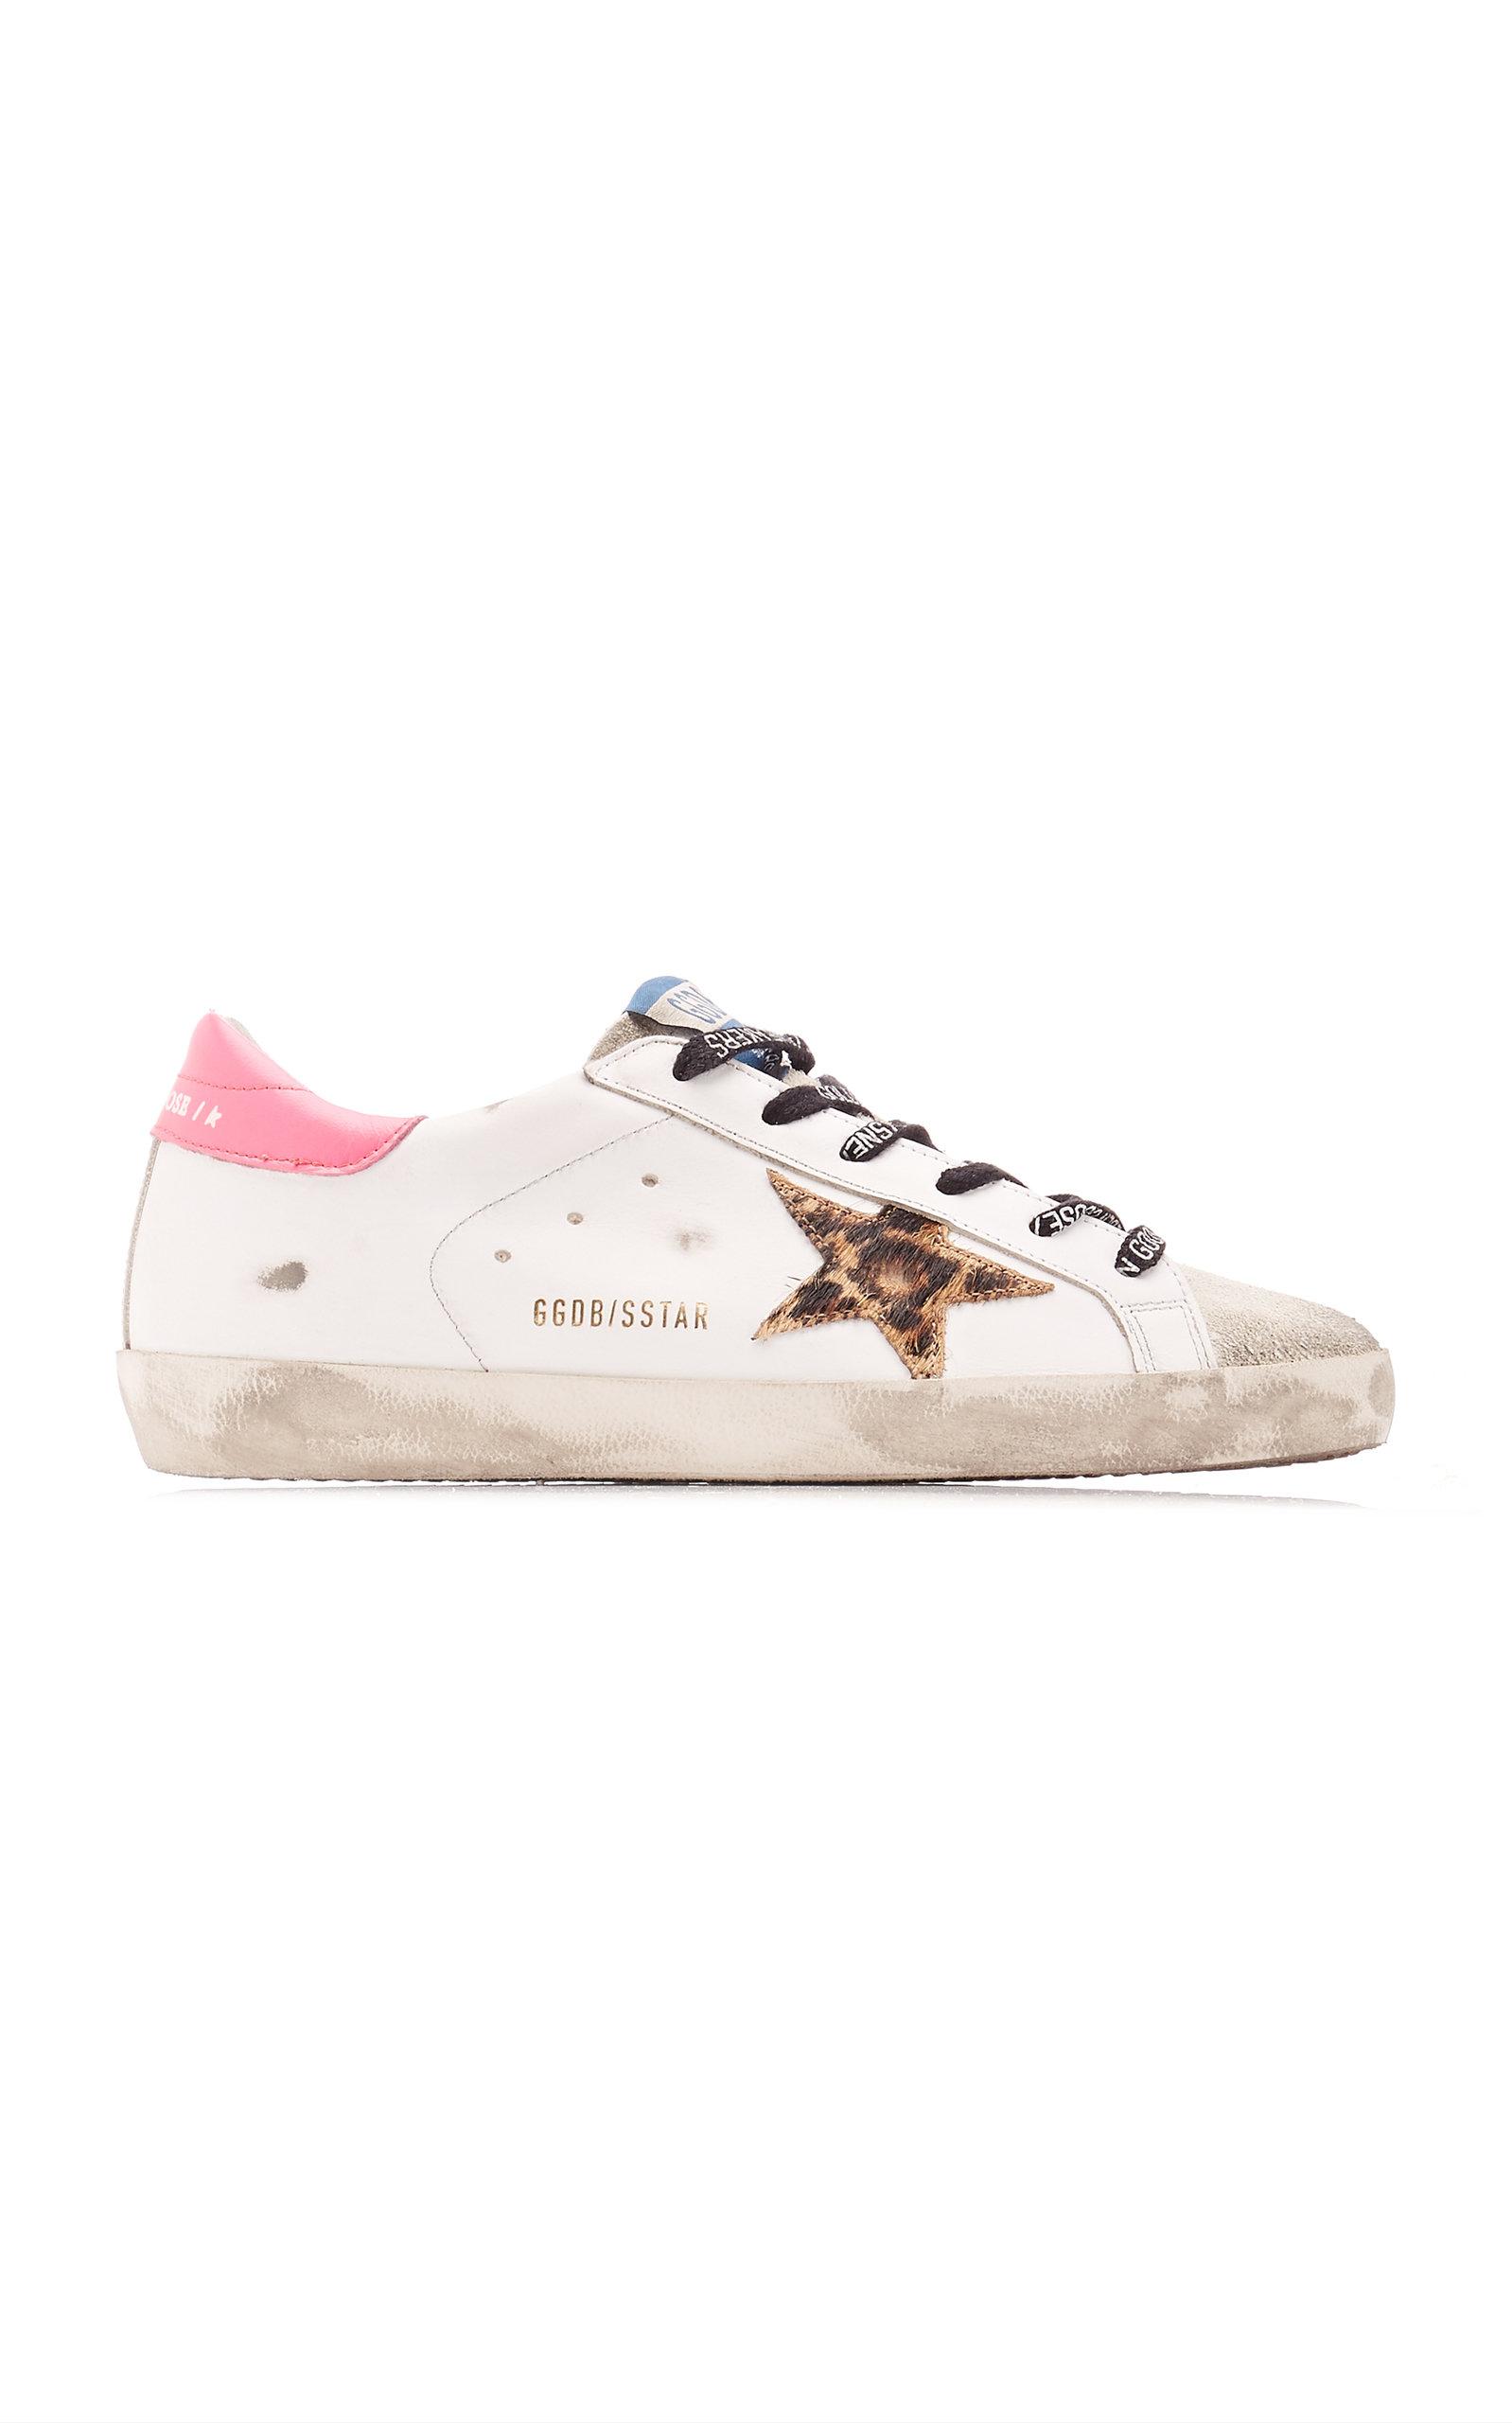 Golden Goose - Women's Superstar Sneakers - Multi - Moda Operandi